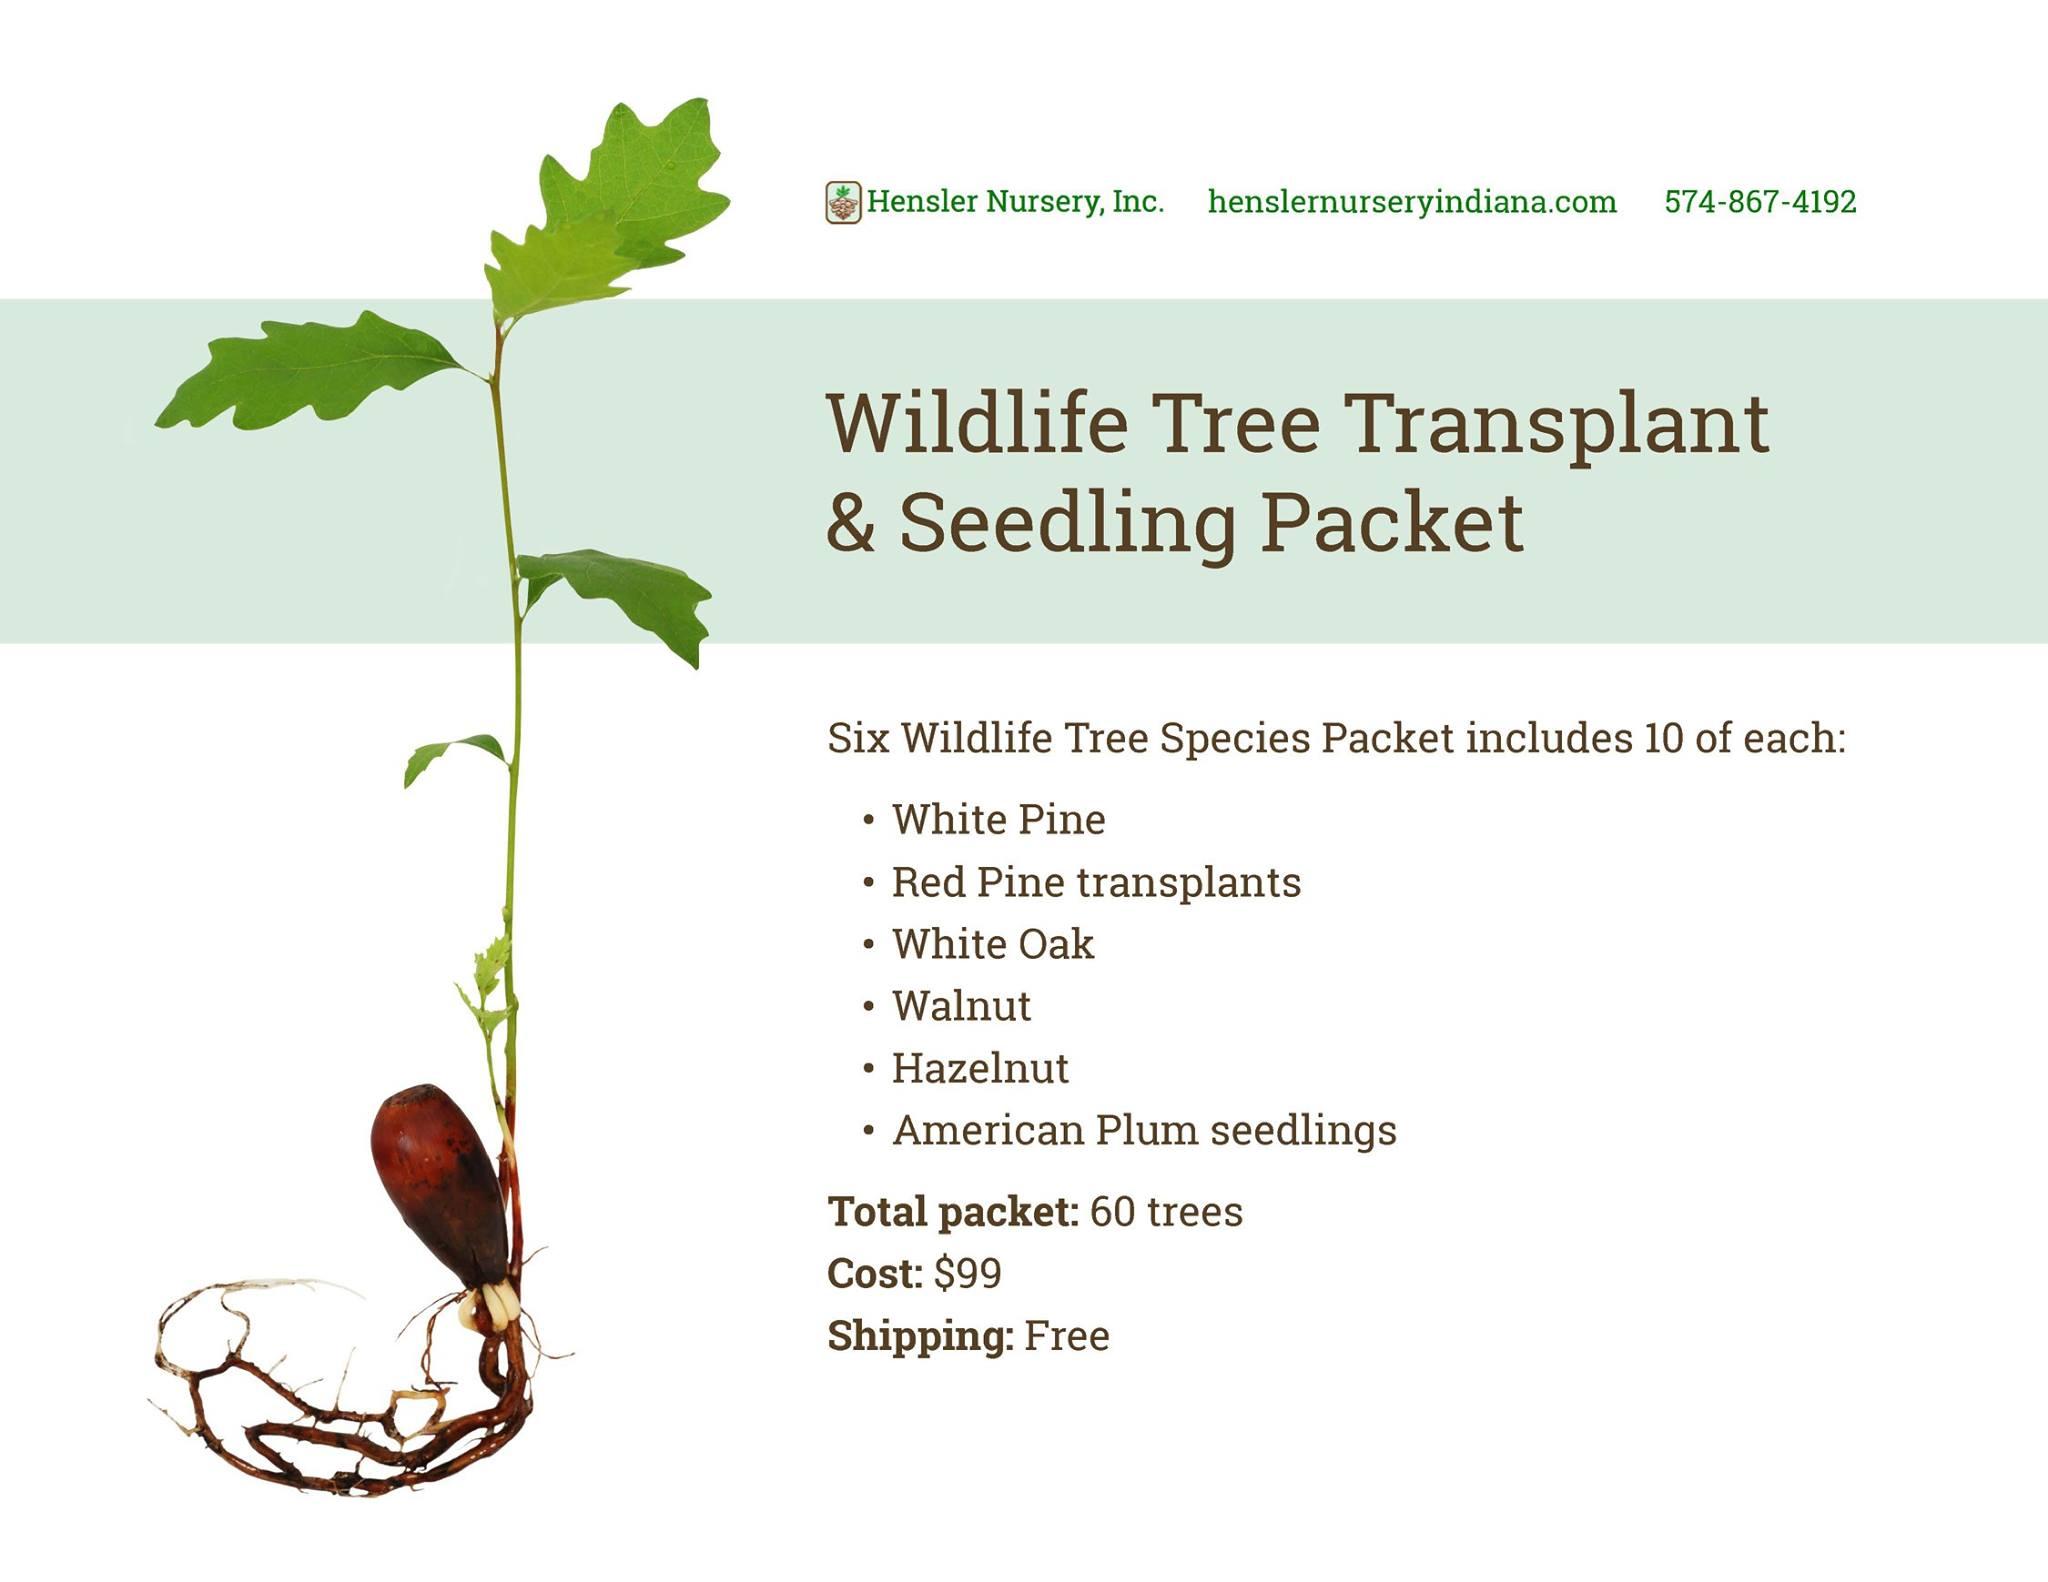 Wildlife Tree Transplant and Seedling Packet